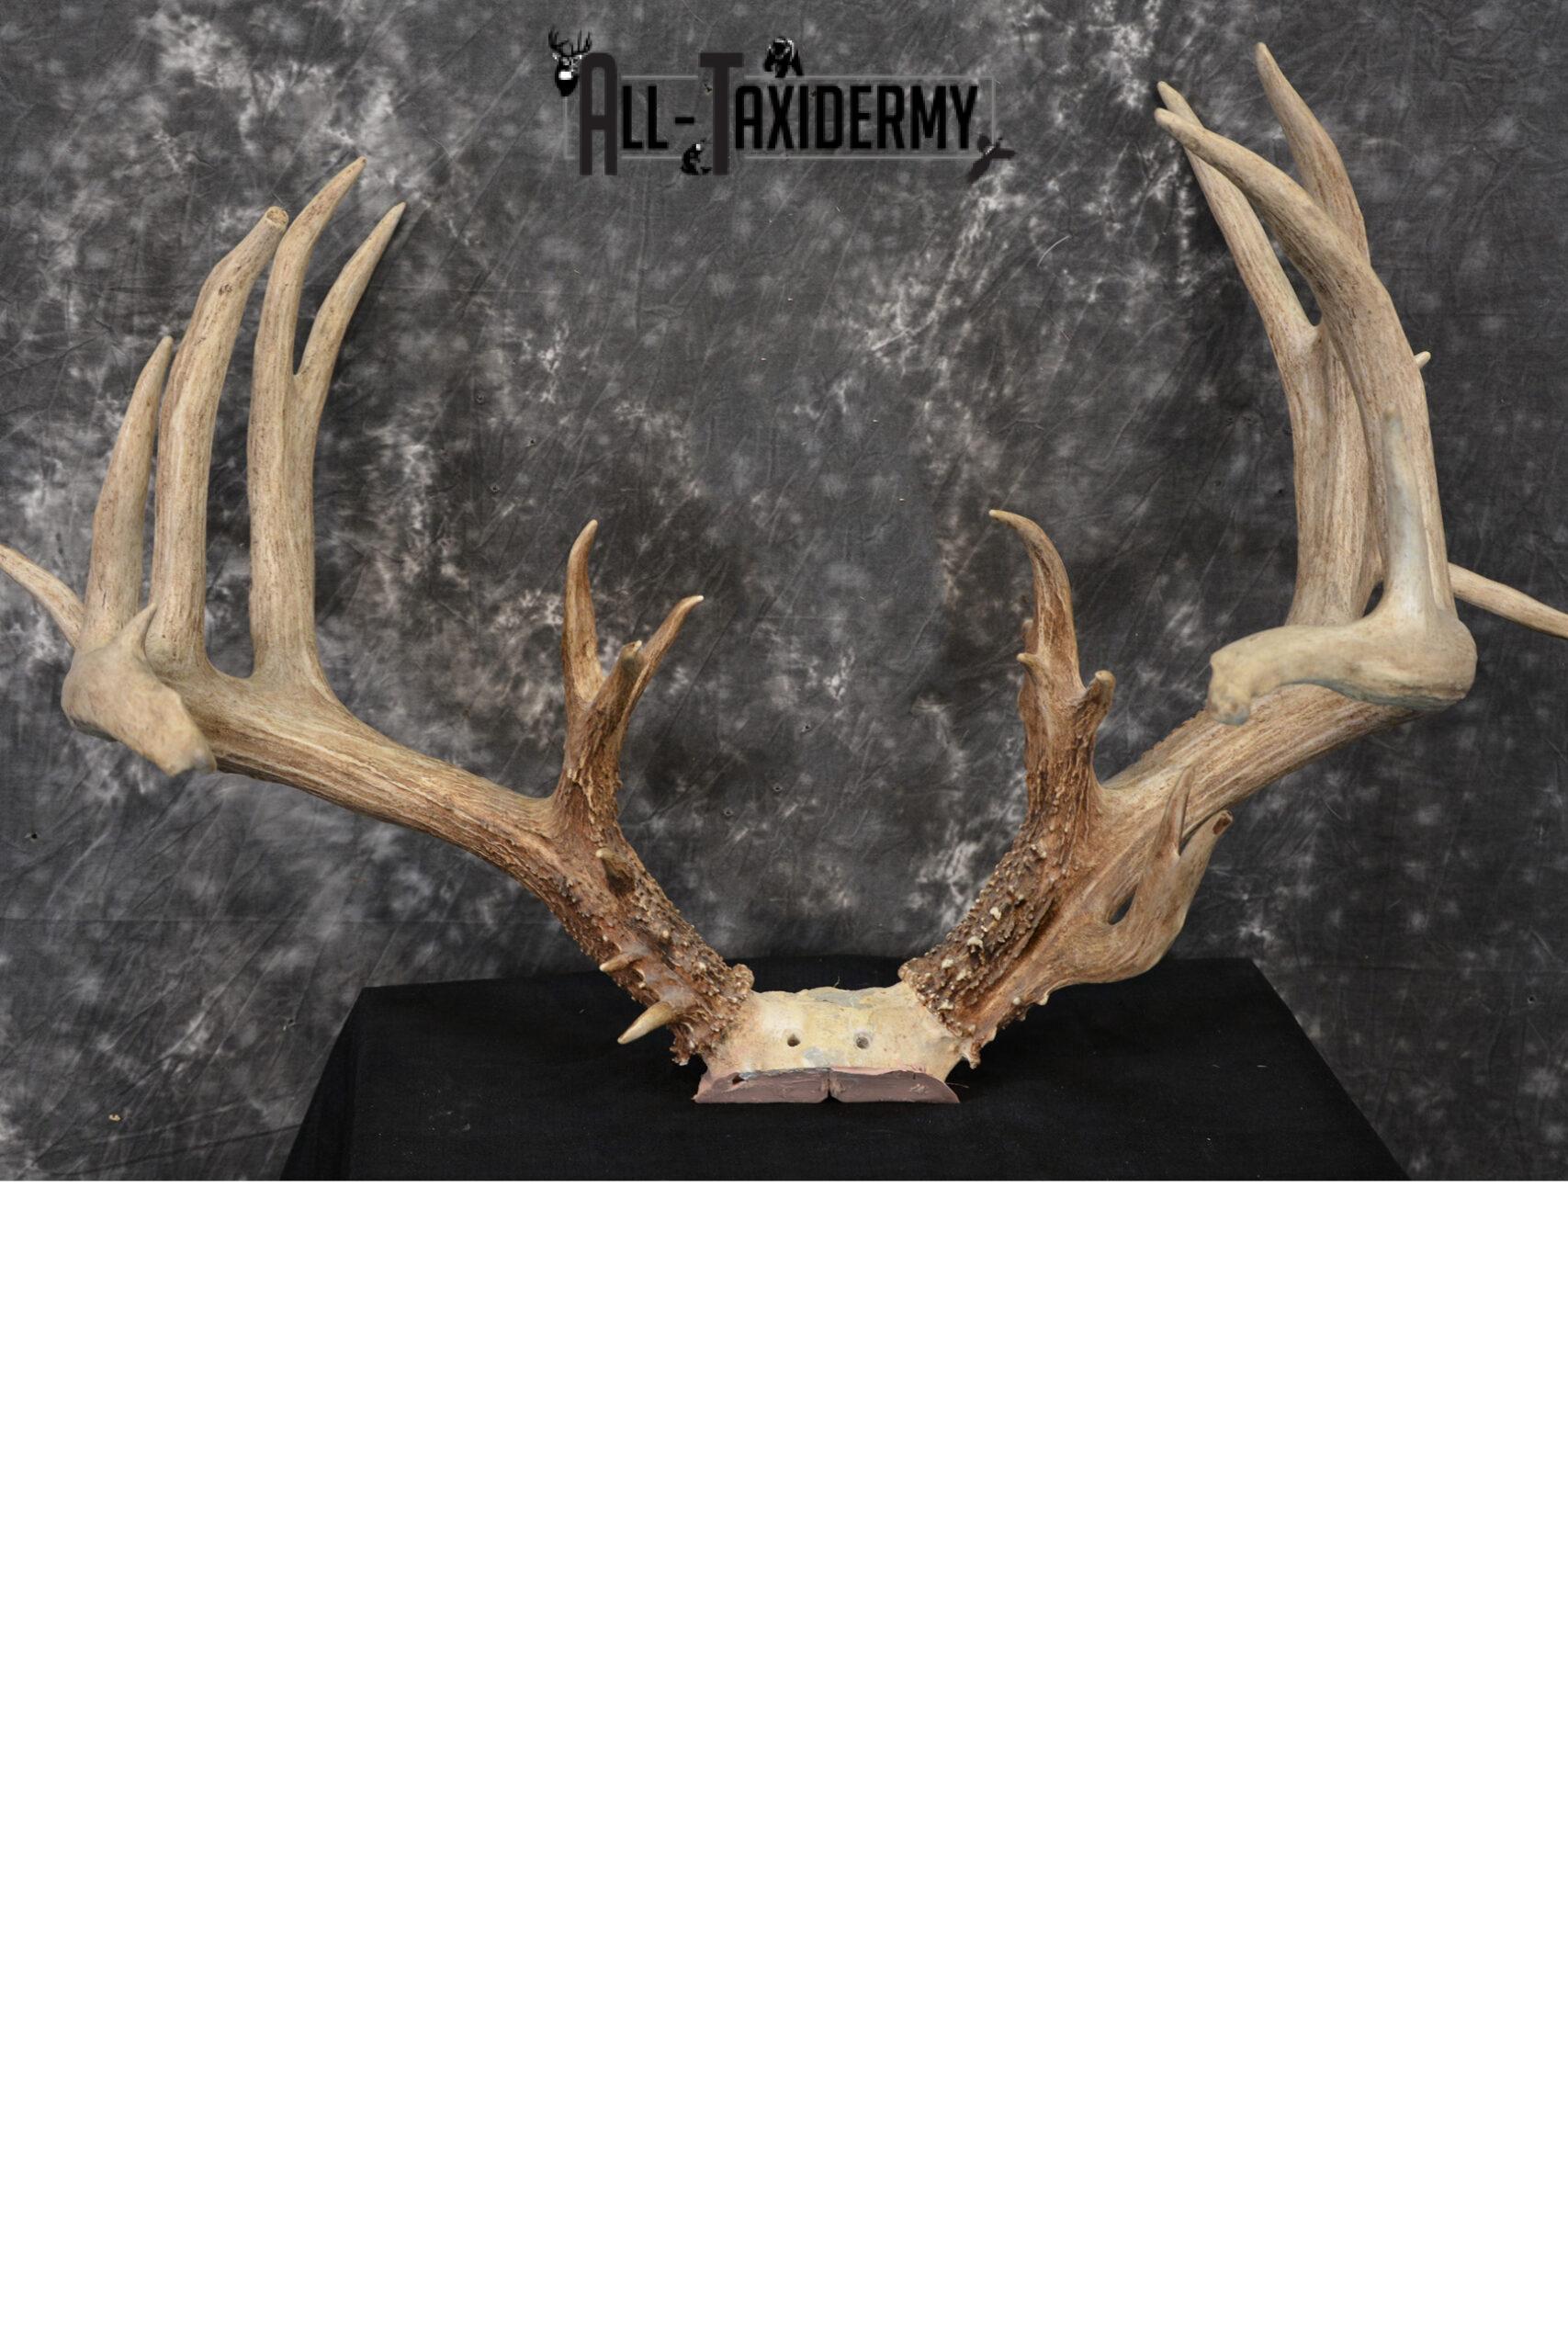 Whitetail Wild Taxidermy Skull Plate Trophy Score 242 5/8 SKU 1072